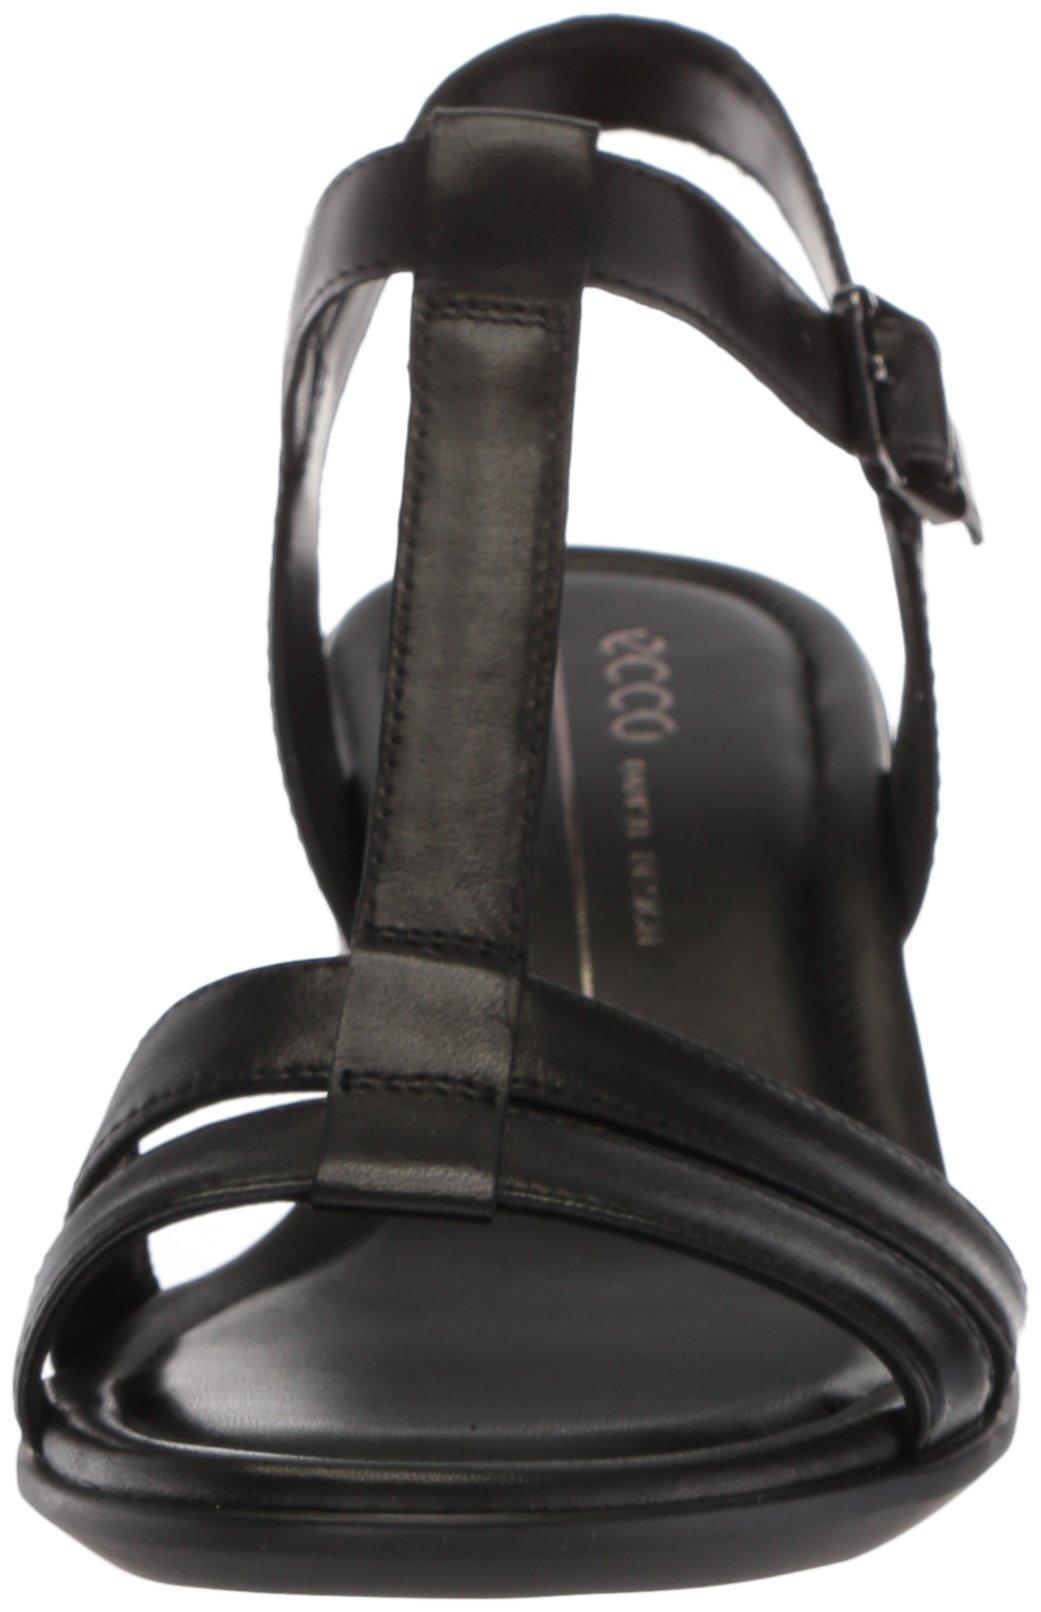 ECCO Women's Women's Shape 35 T-Strap Wedge Sandal, Black/Black, 37 M EU (6-6.5 US) by ECCO (Image #4)